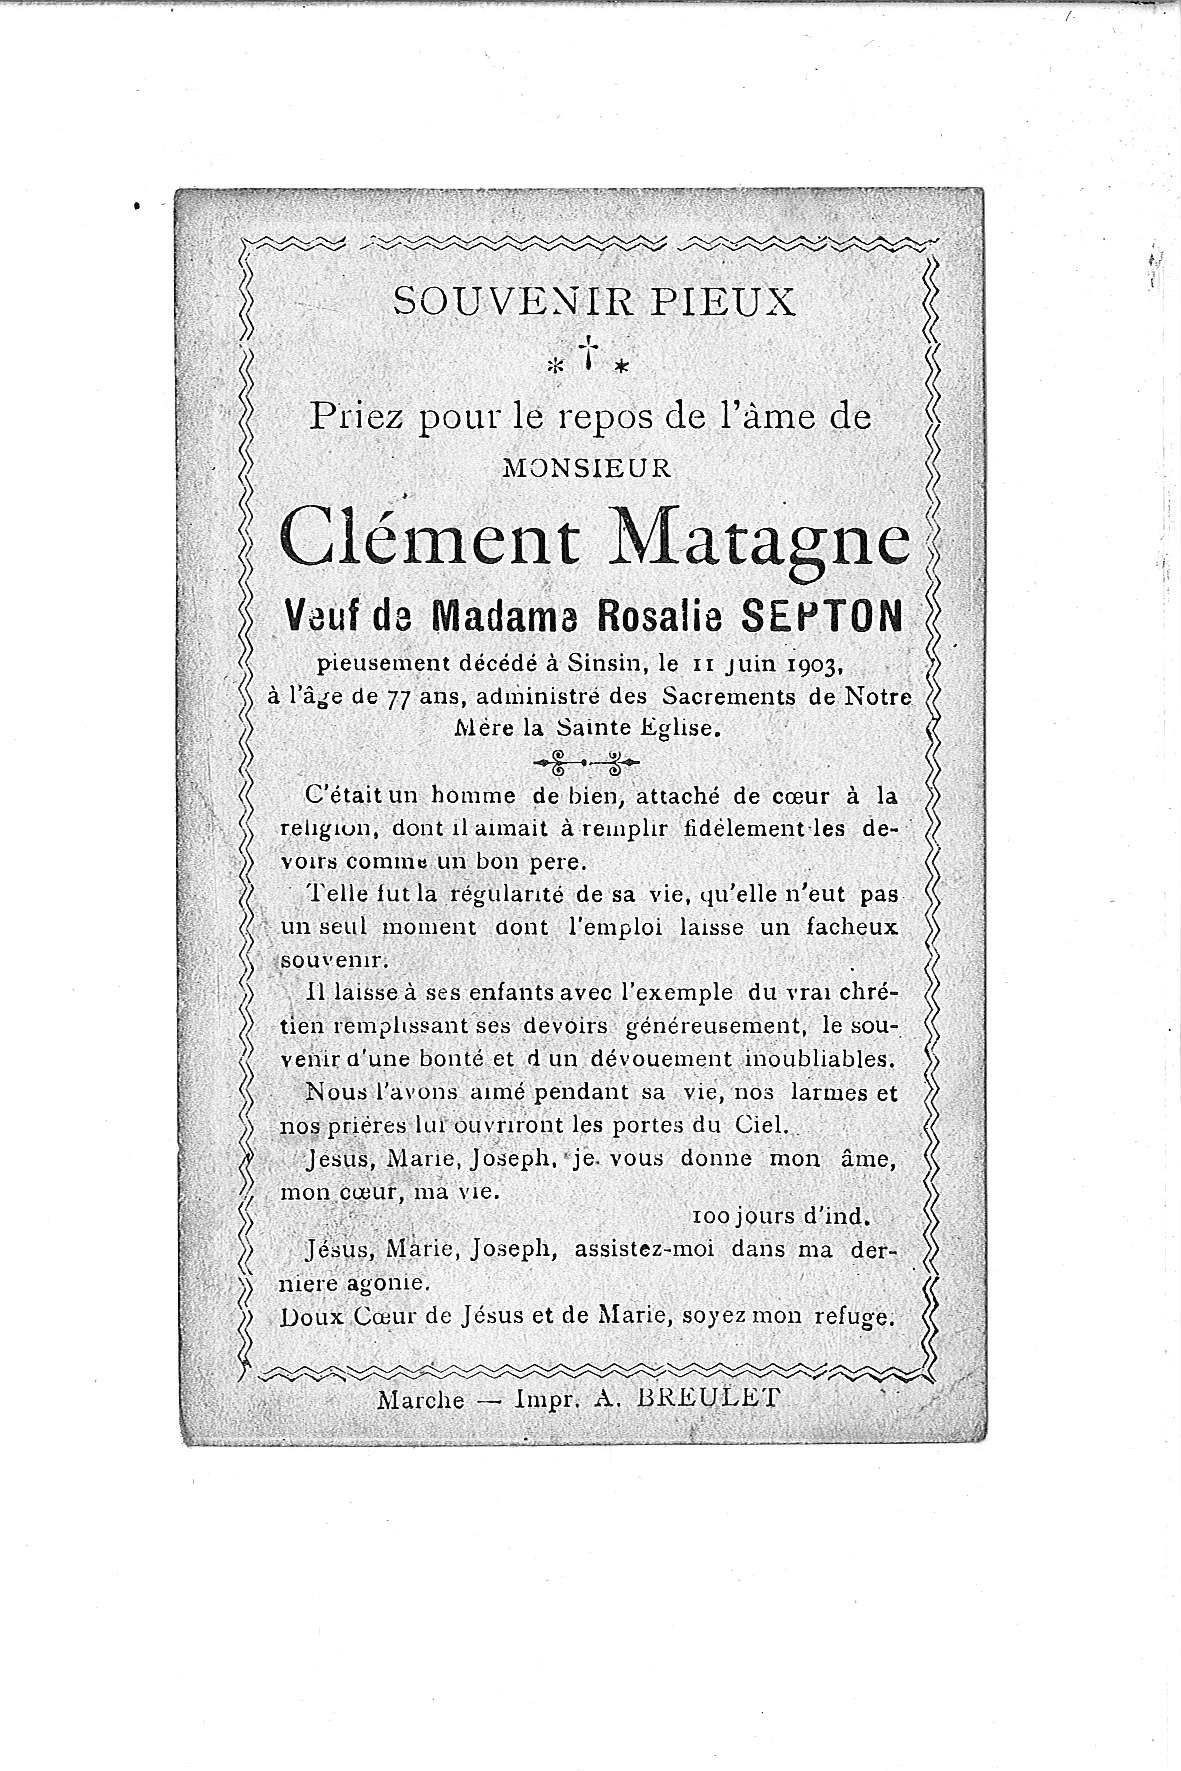 Clément(1903)20120227085536_00034.jpg